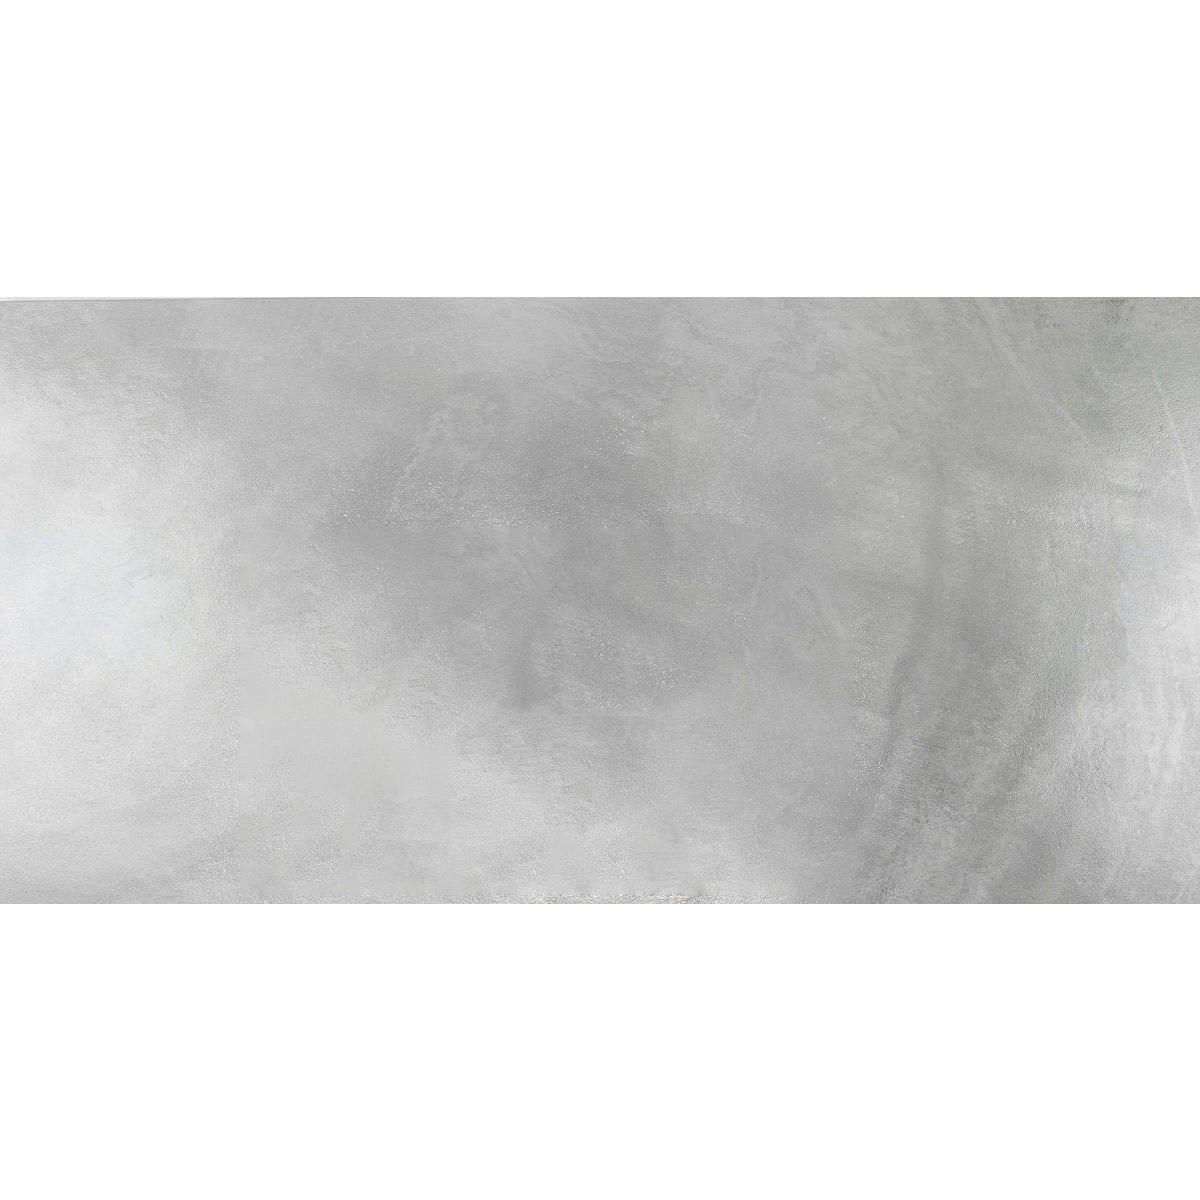 T10044 BRIGHT PEARL SNOW RETT P1